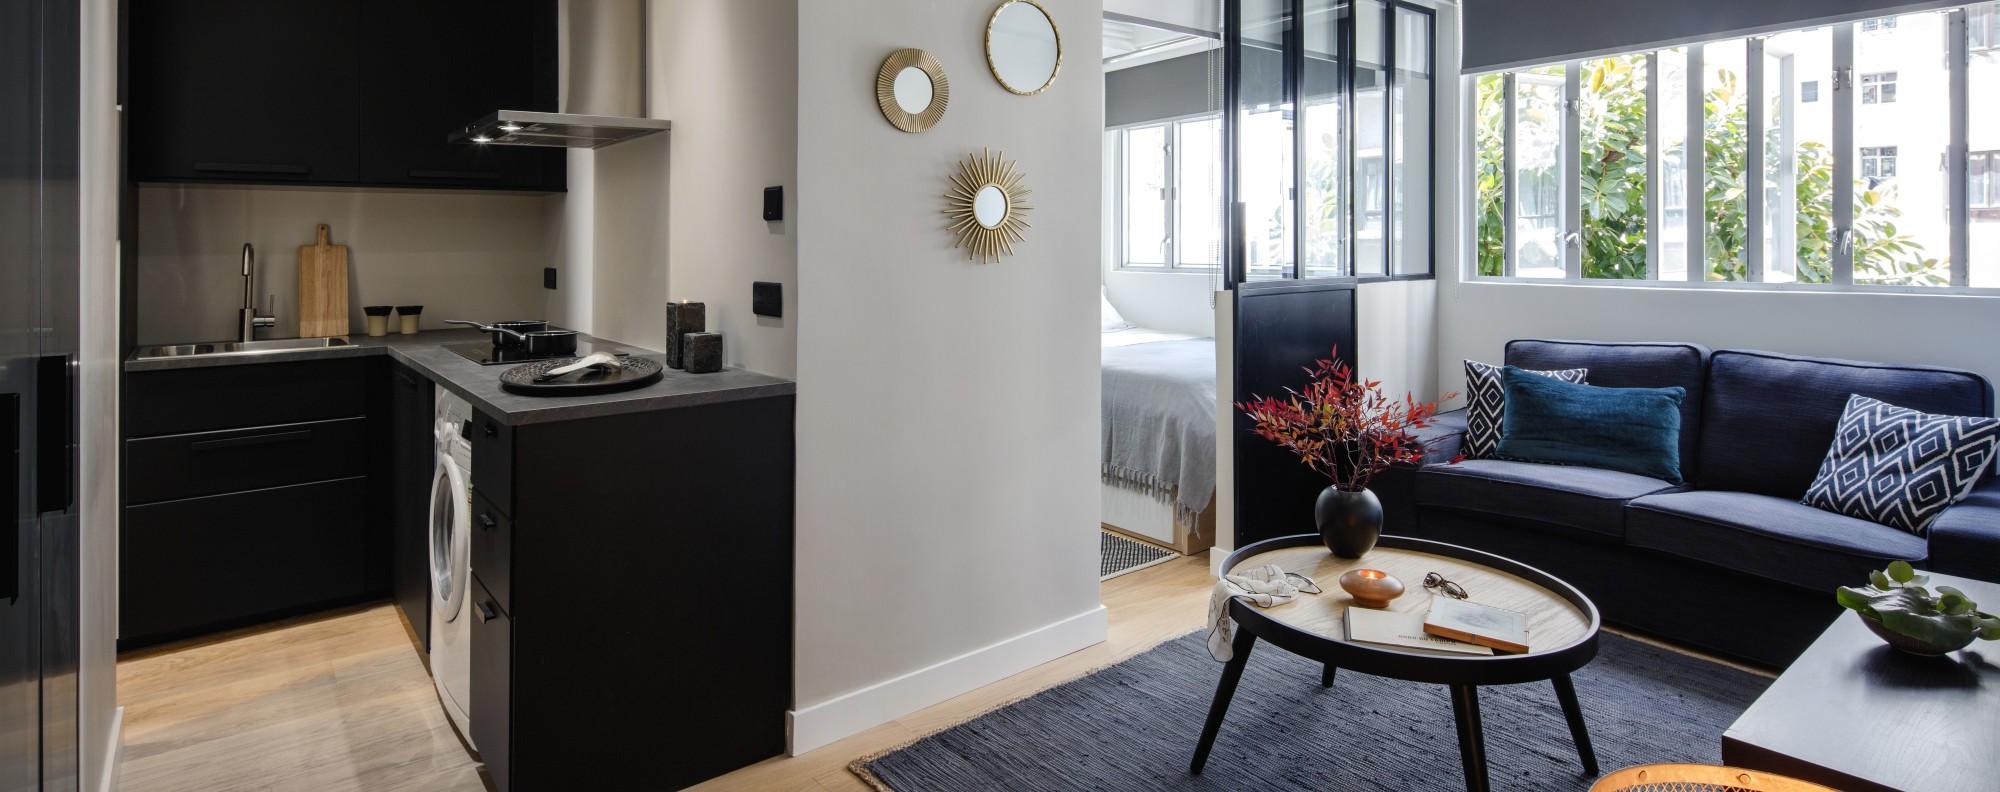 Noemie Bernard's 300 sq ft flat in Kennedy Town.